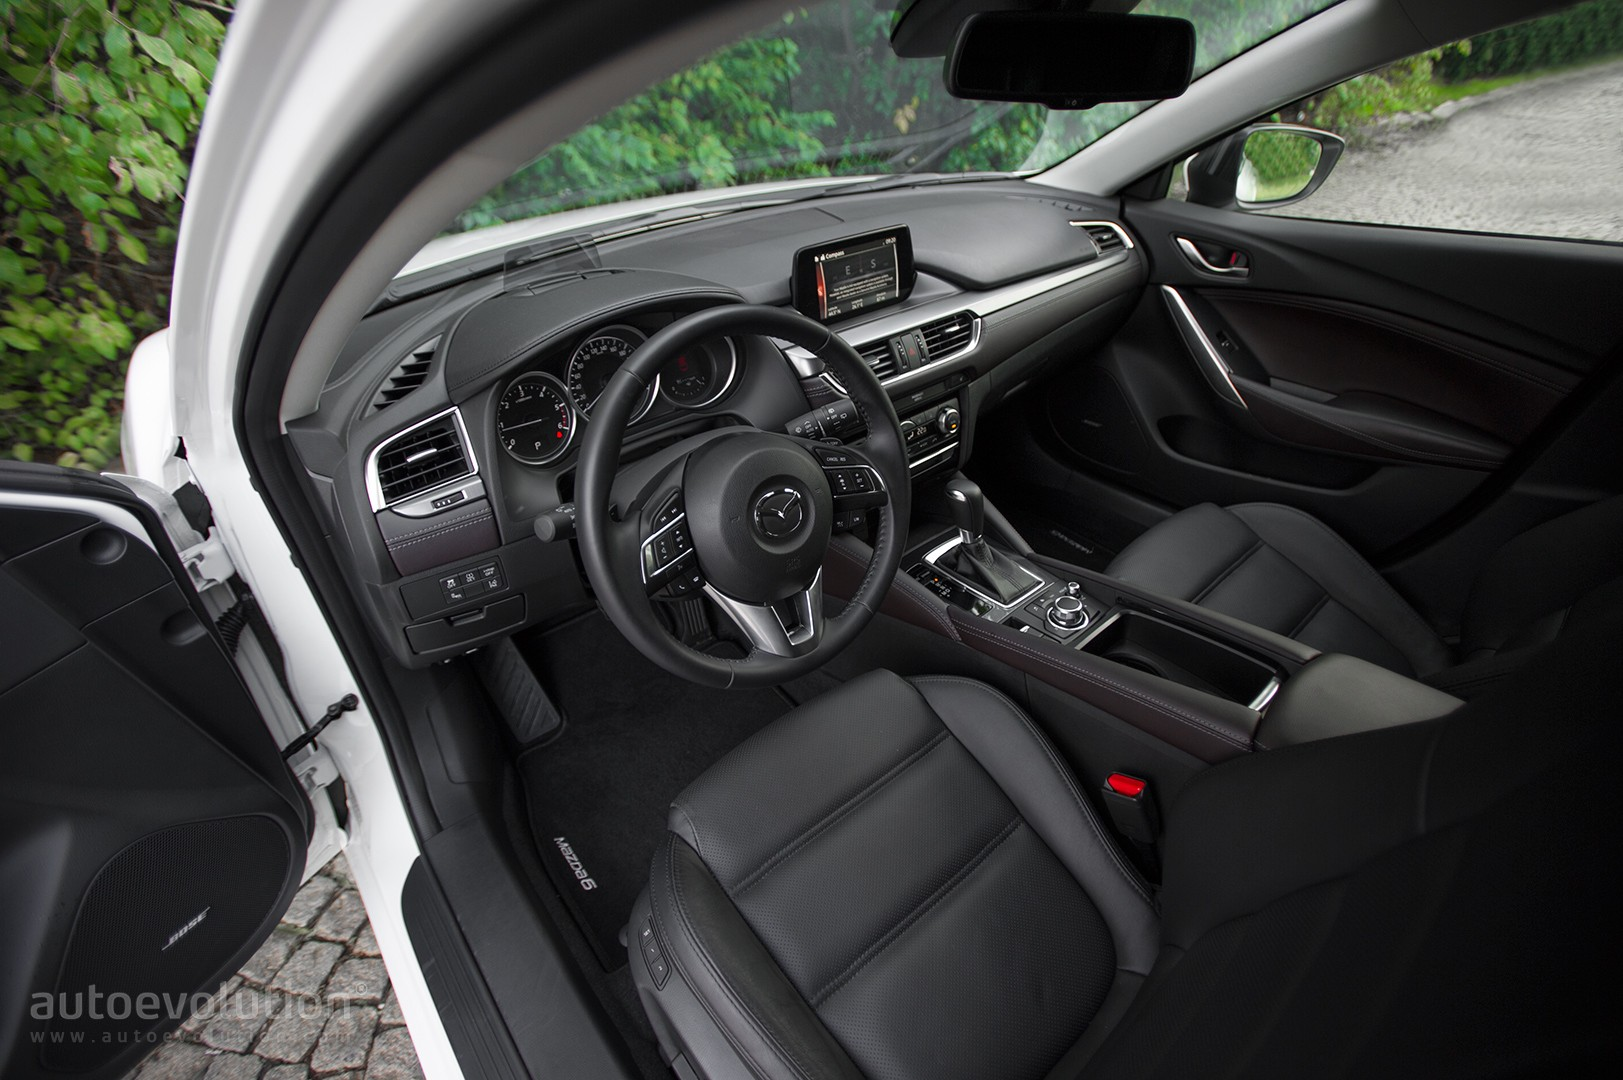 2016 mazda6 wagon 2.2 skyactiv-d review - autoevolution